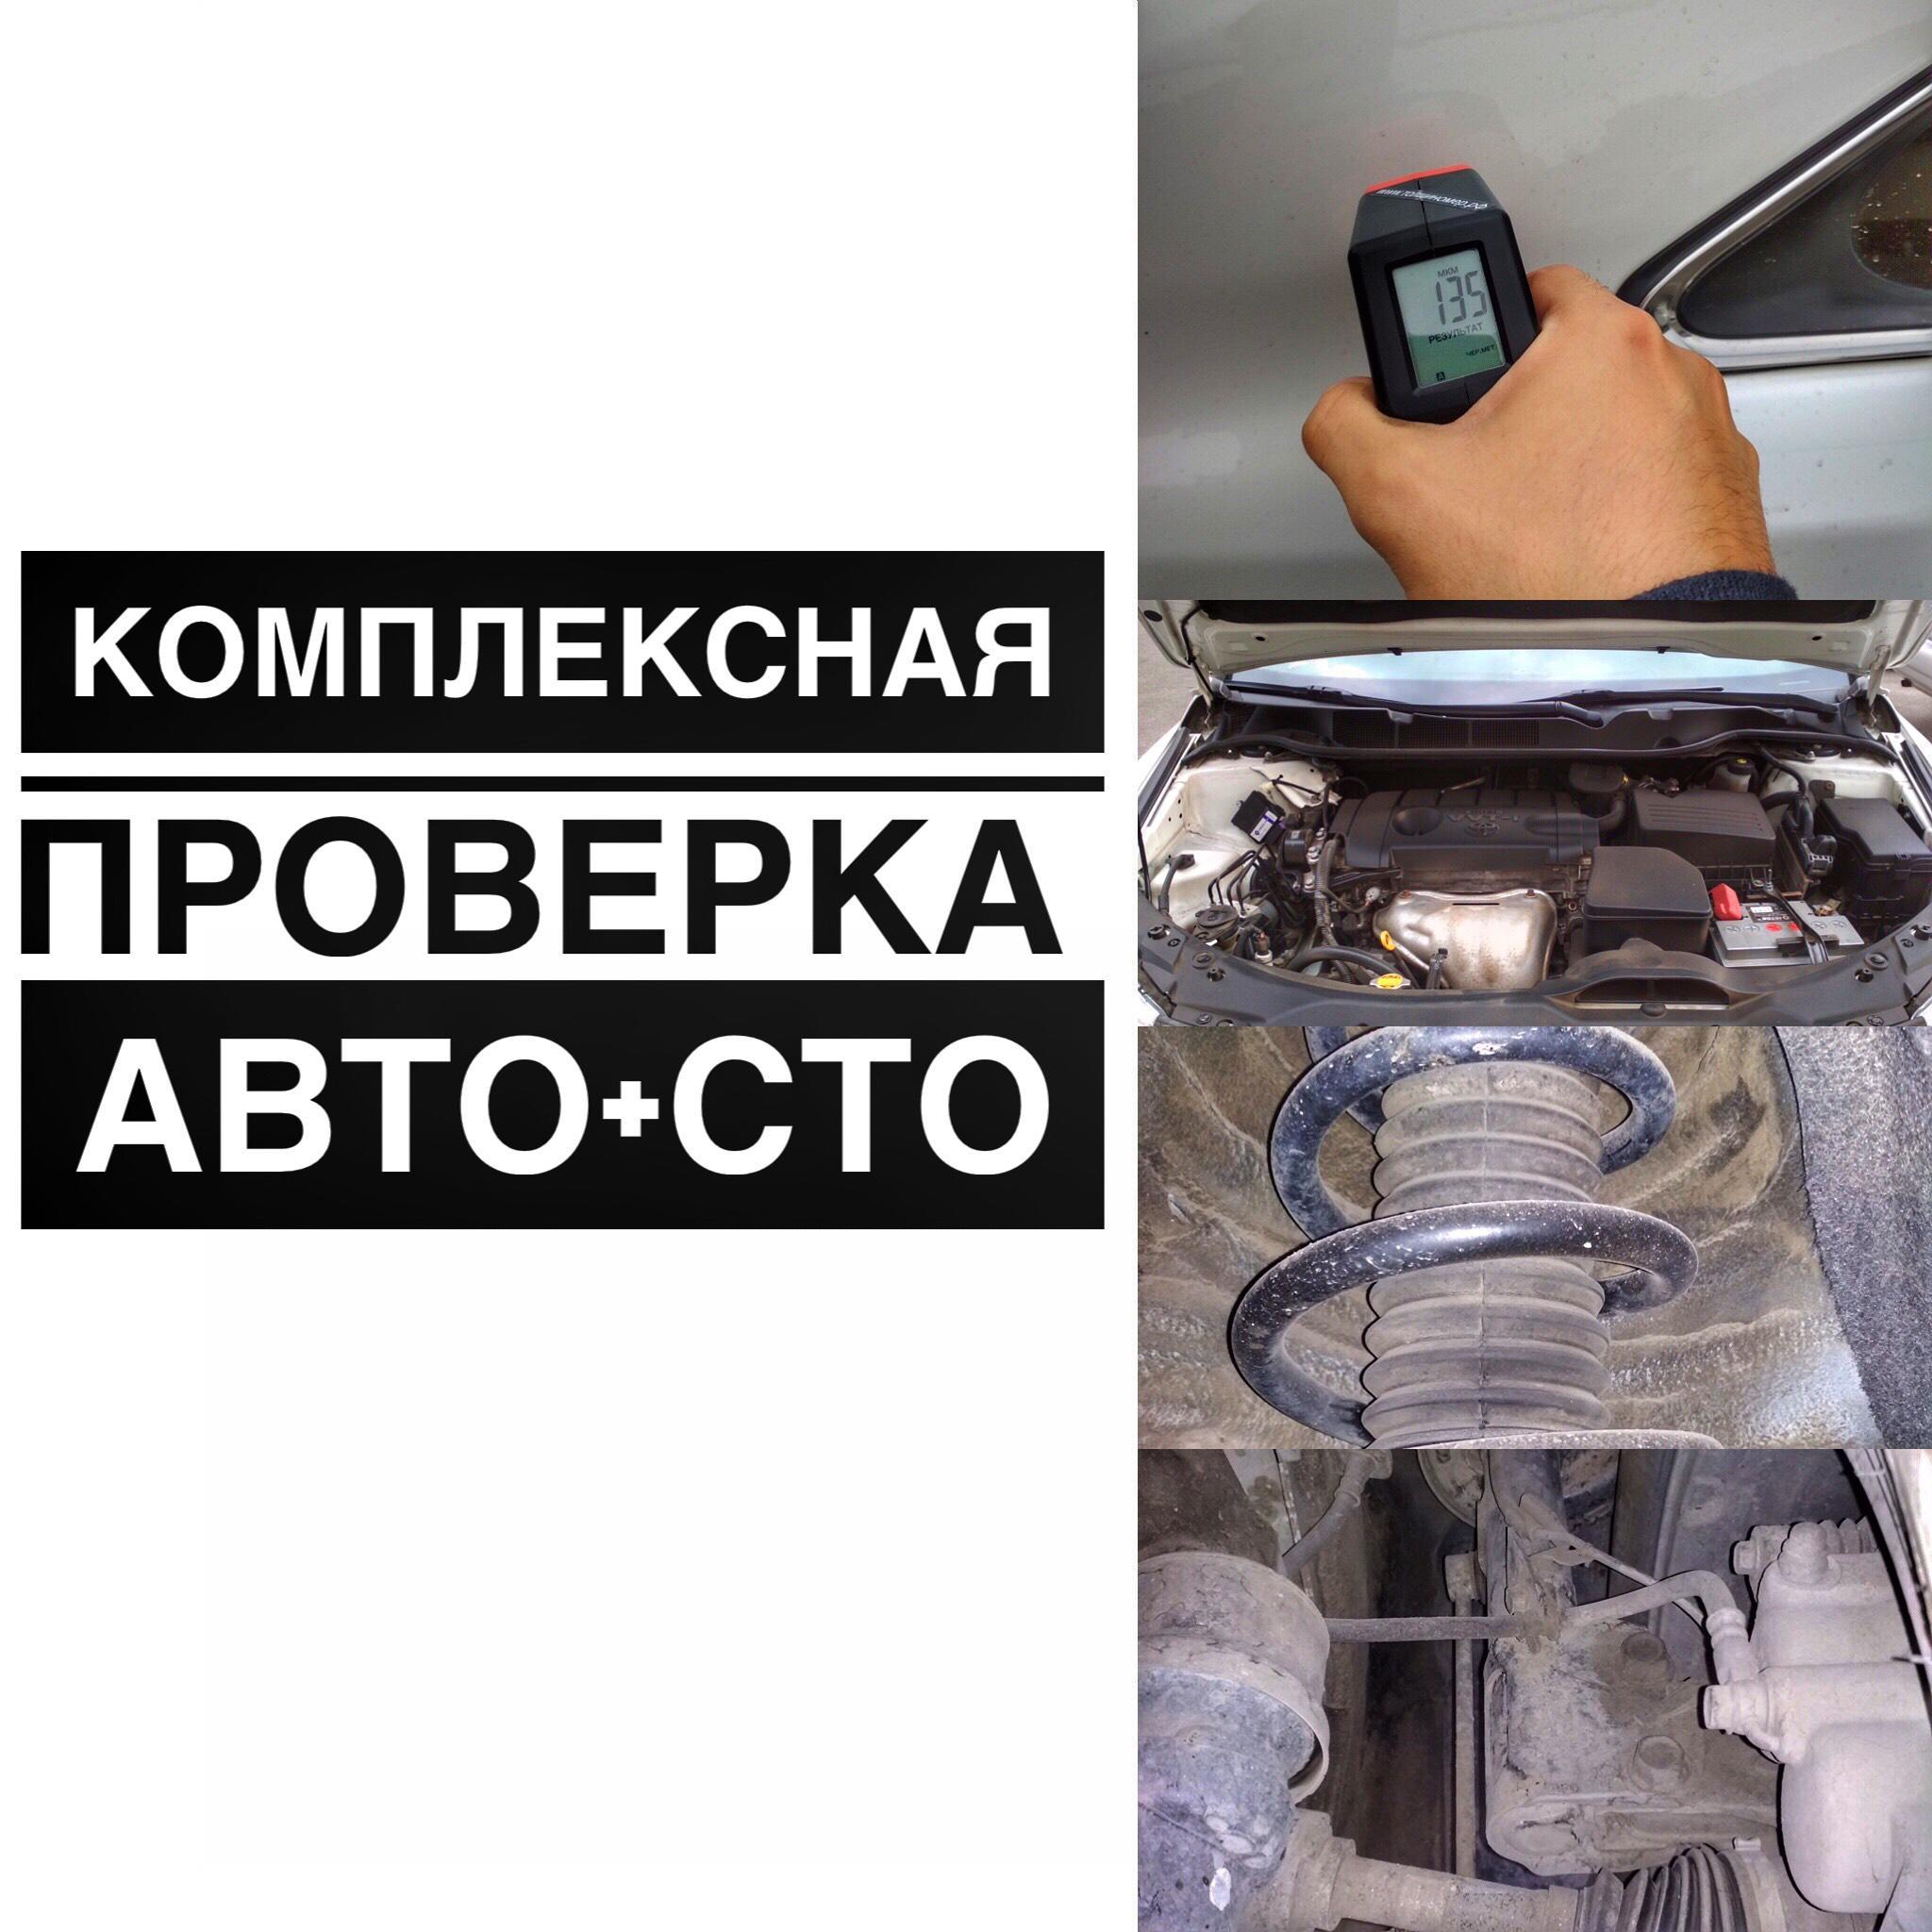 проверка авто на сто ходовой компьютерная диагностика авто